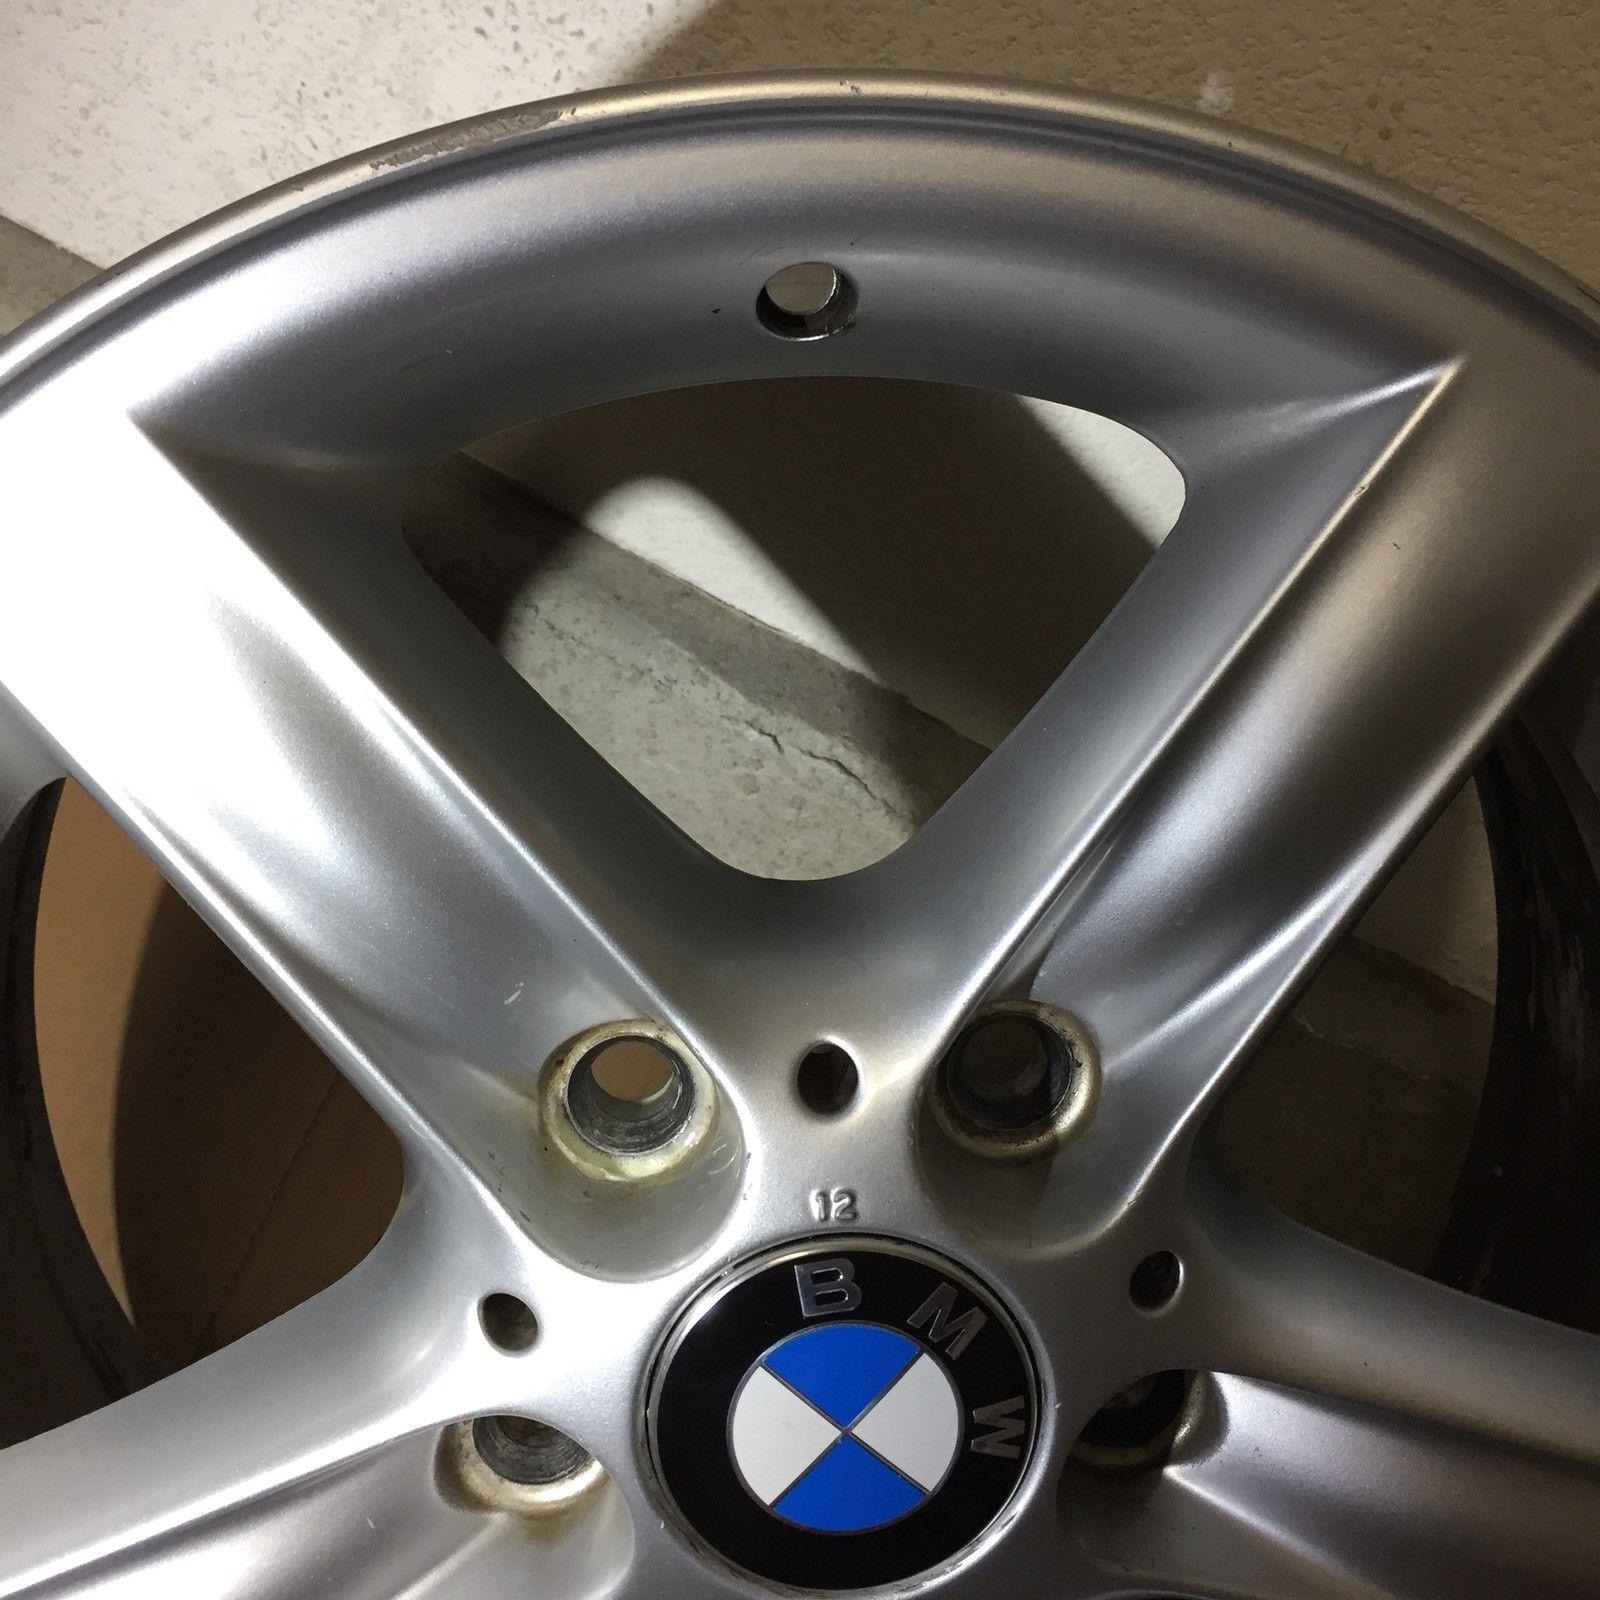 Used Bmw 3 Series 16 7 Inch Wheel Oem Factory Alloy Rim 59288 2017 2018 Mycarboard Com